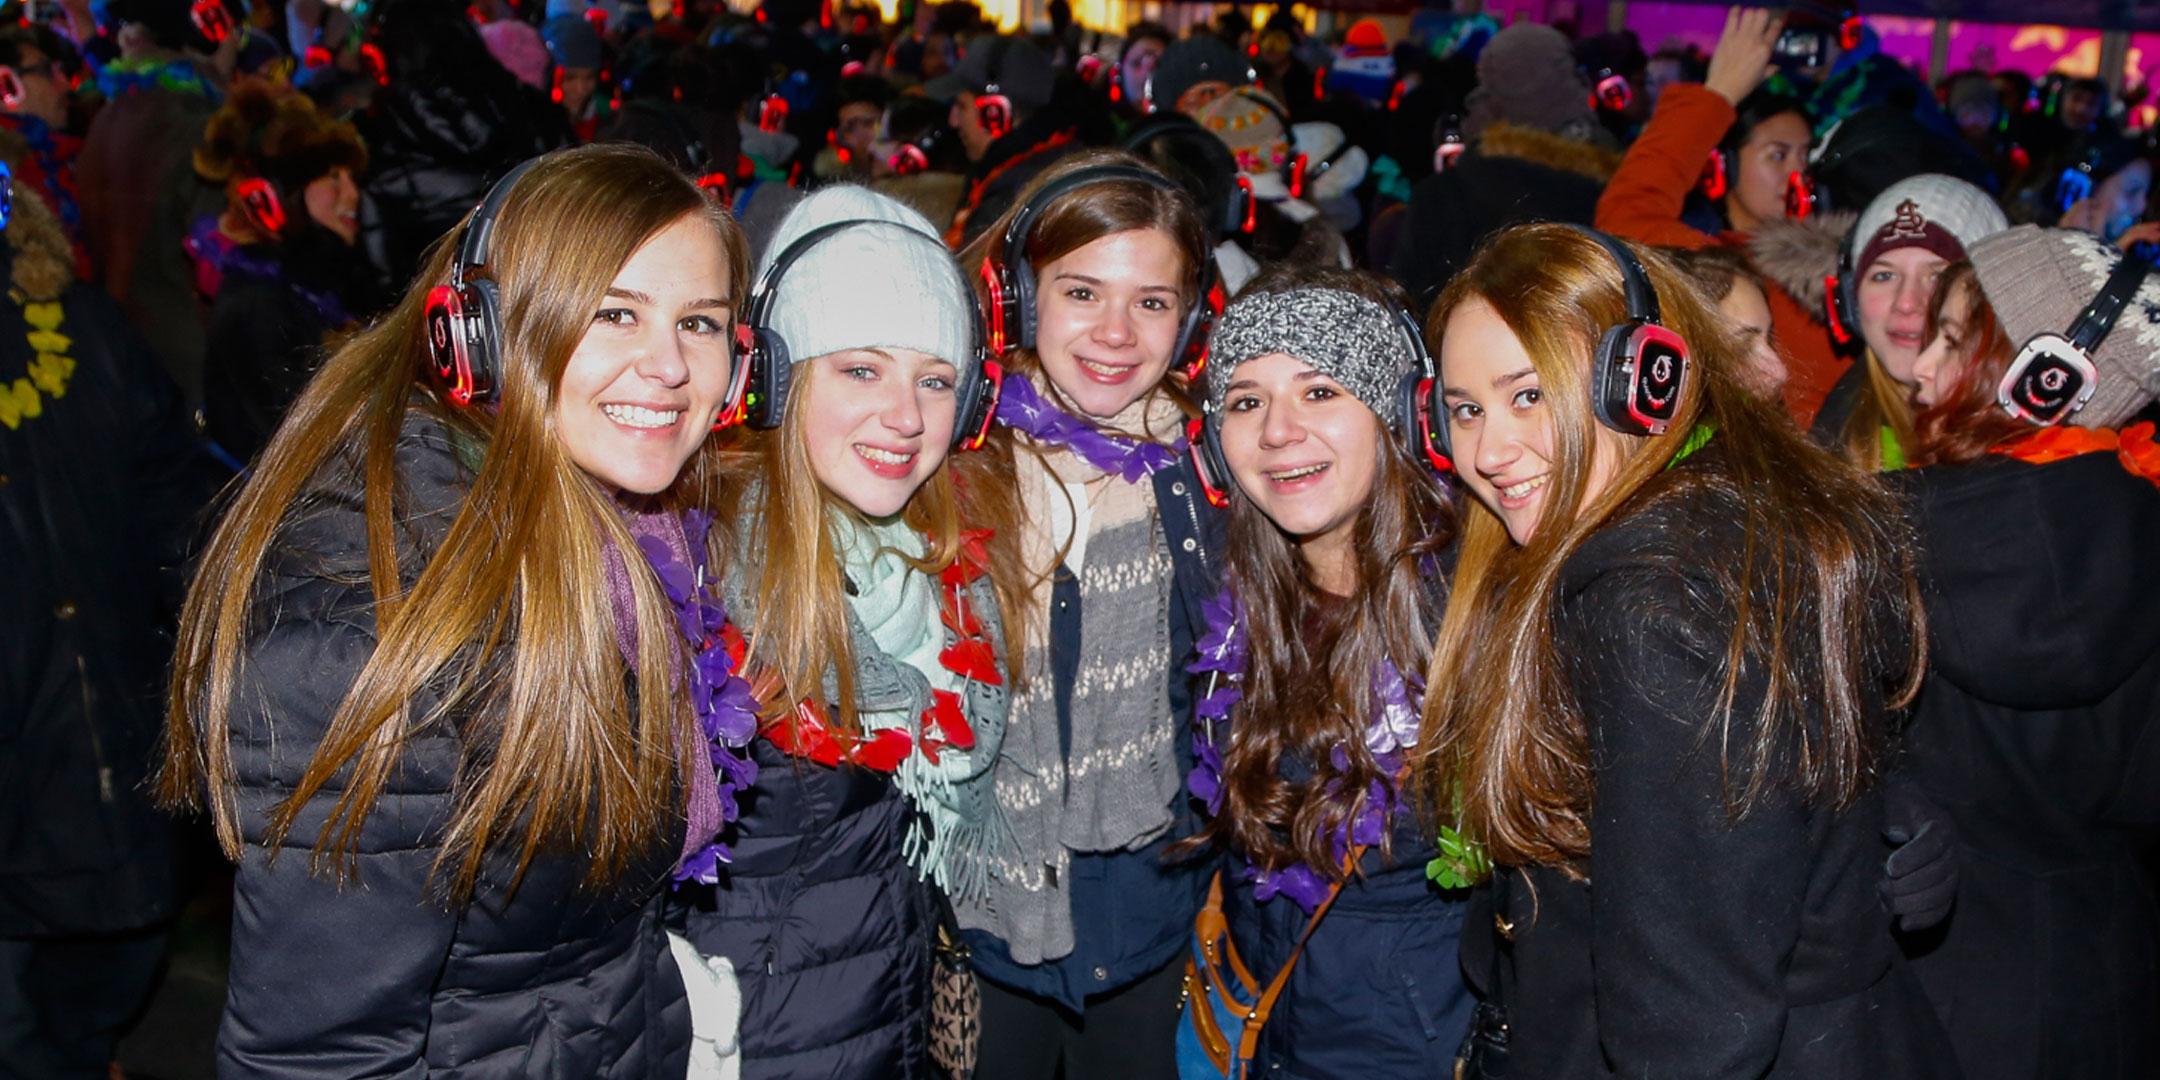 Winterfestival silent disco party